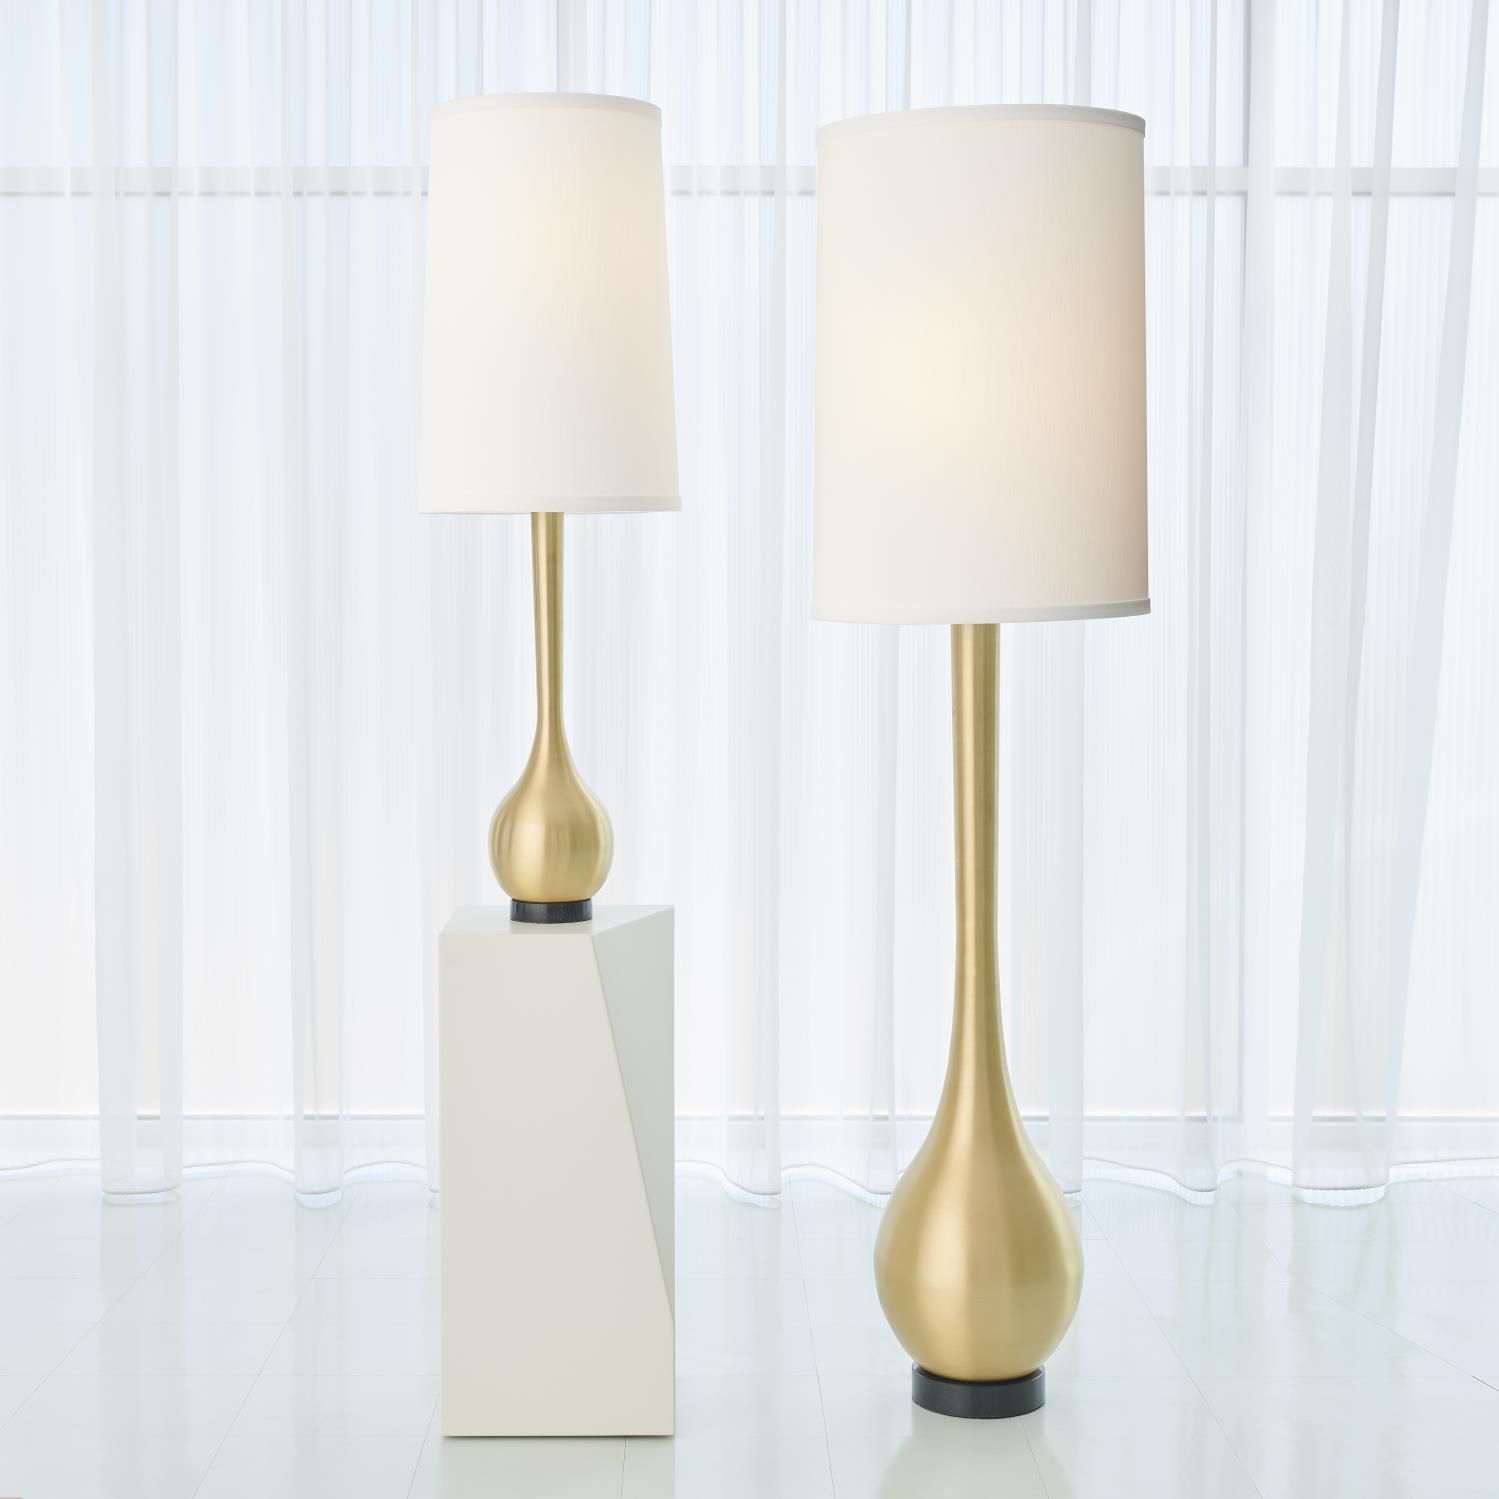 Bulb Vase Table Lamp In An Antique Brass Finish Katzberry Home Decor